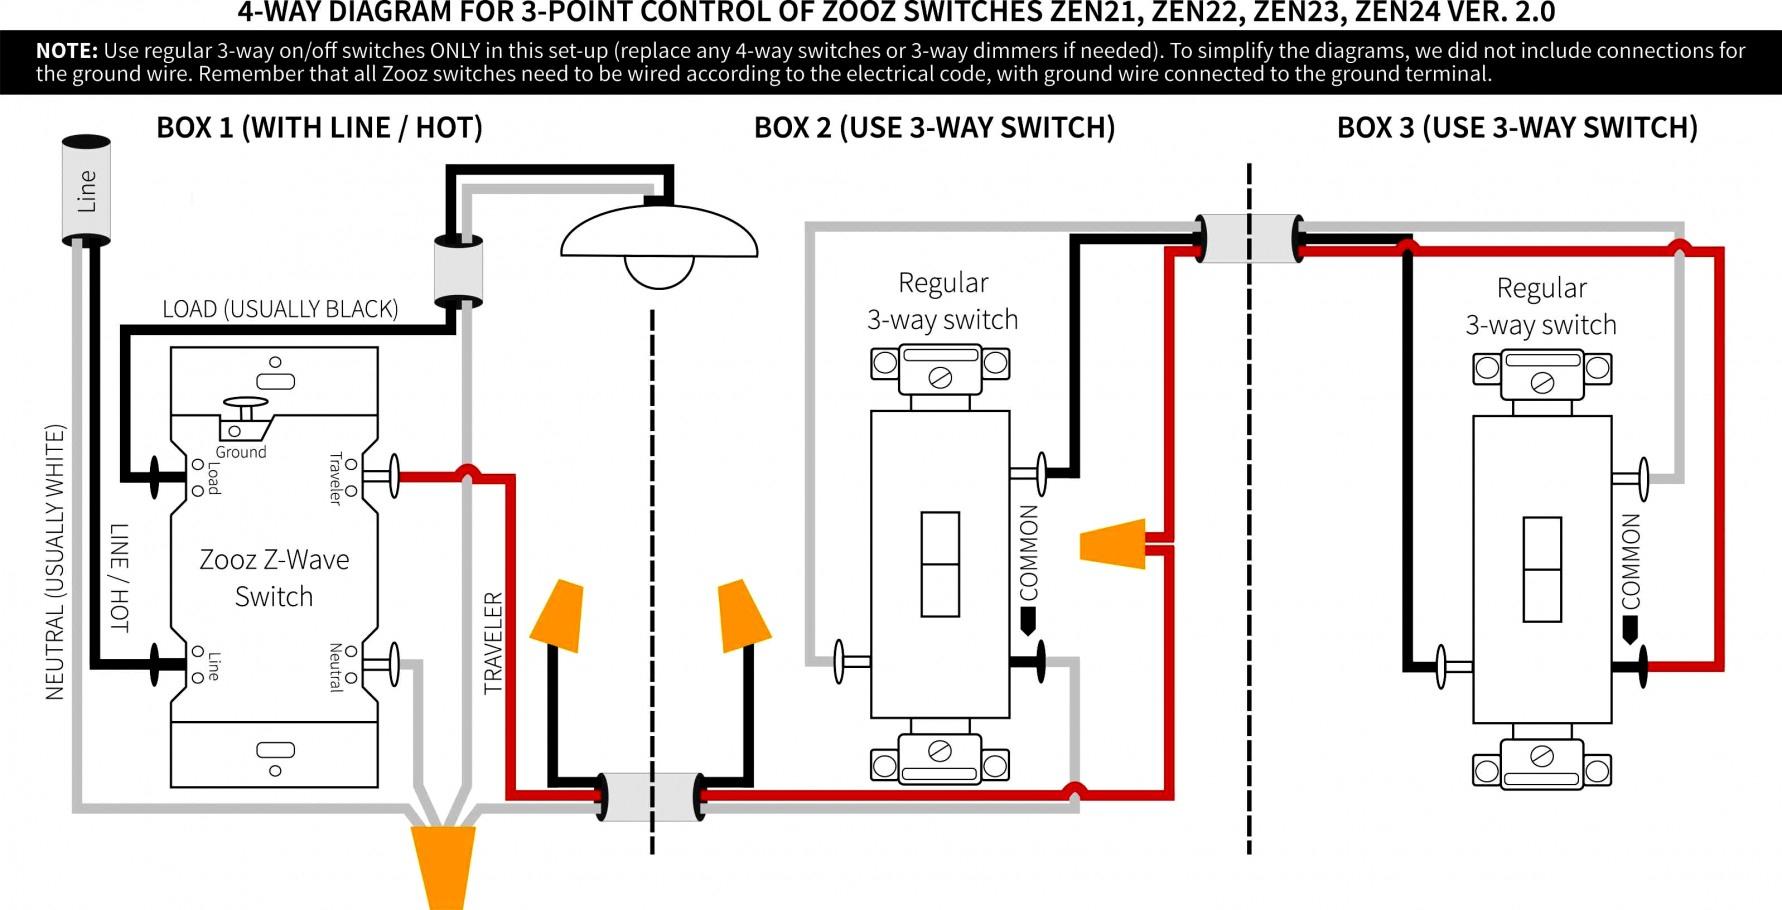 Wonderful Simple 3 Way Switch Wiring Diagram Video On How To Wire A - 3Way Switch Wiring Diagram